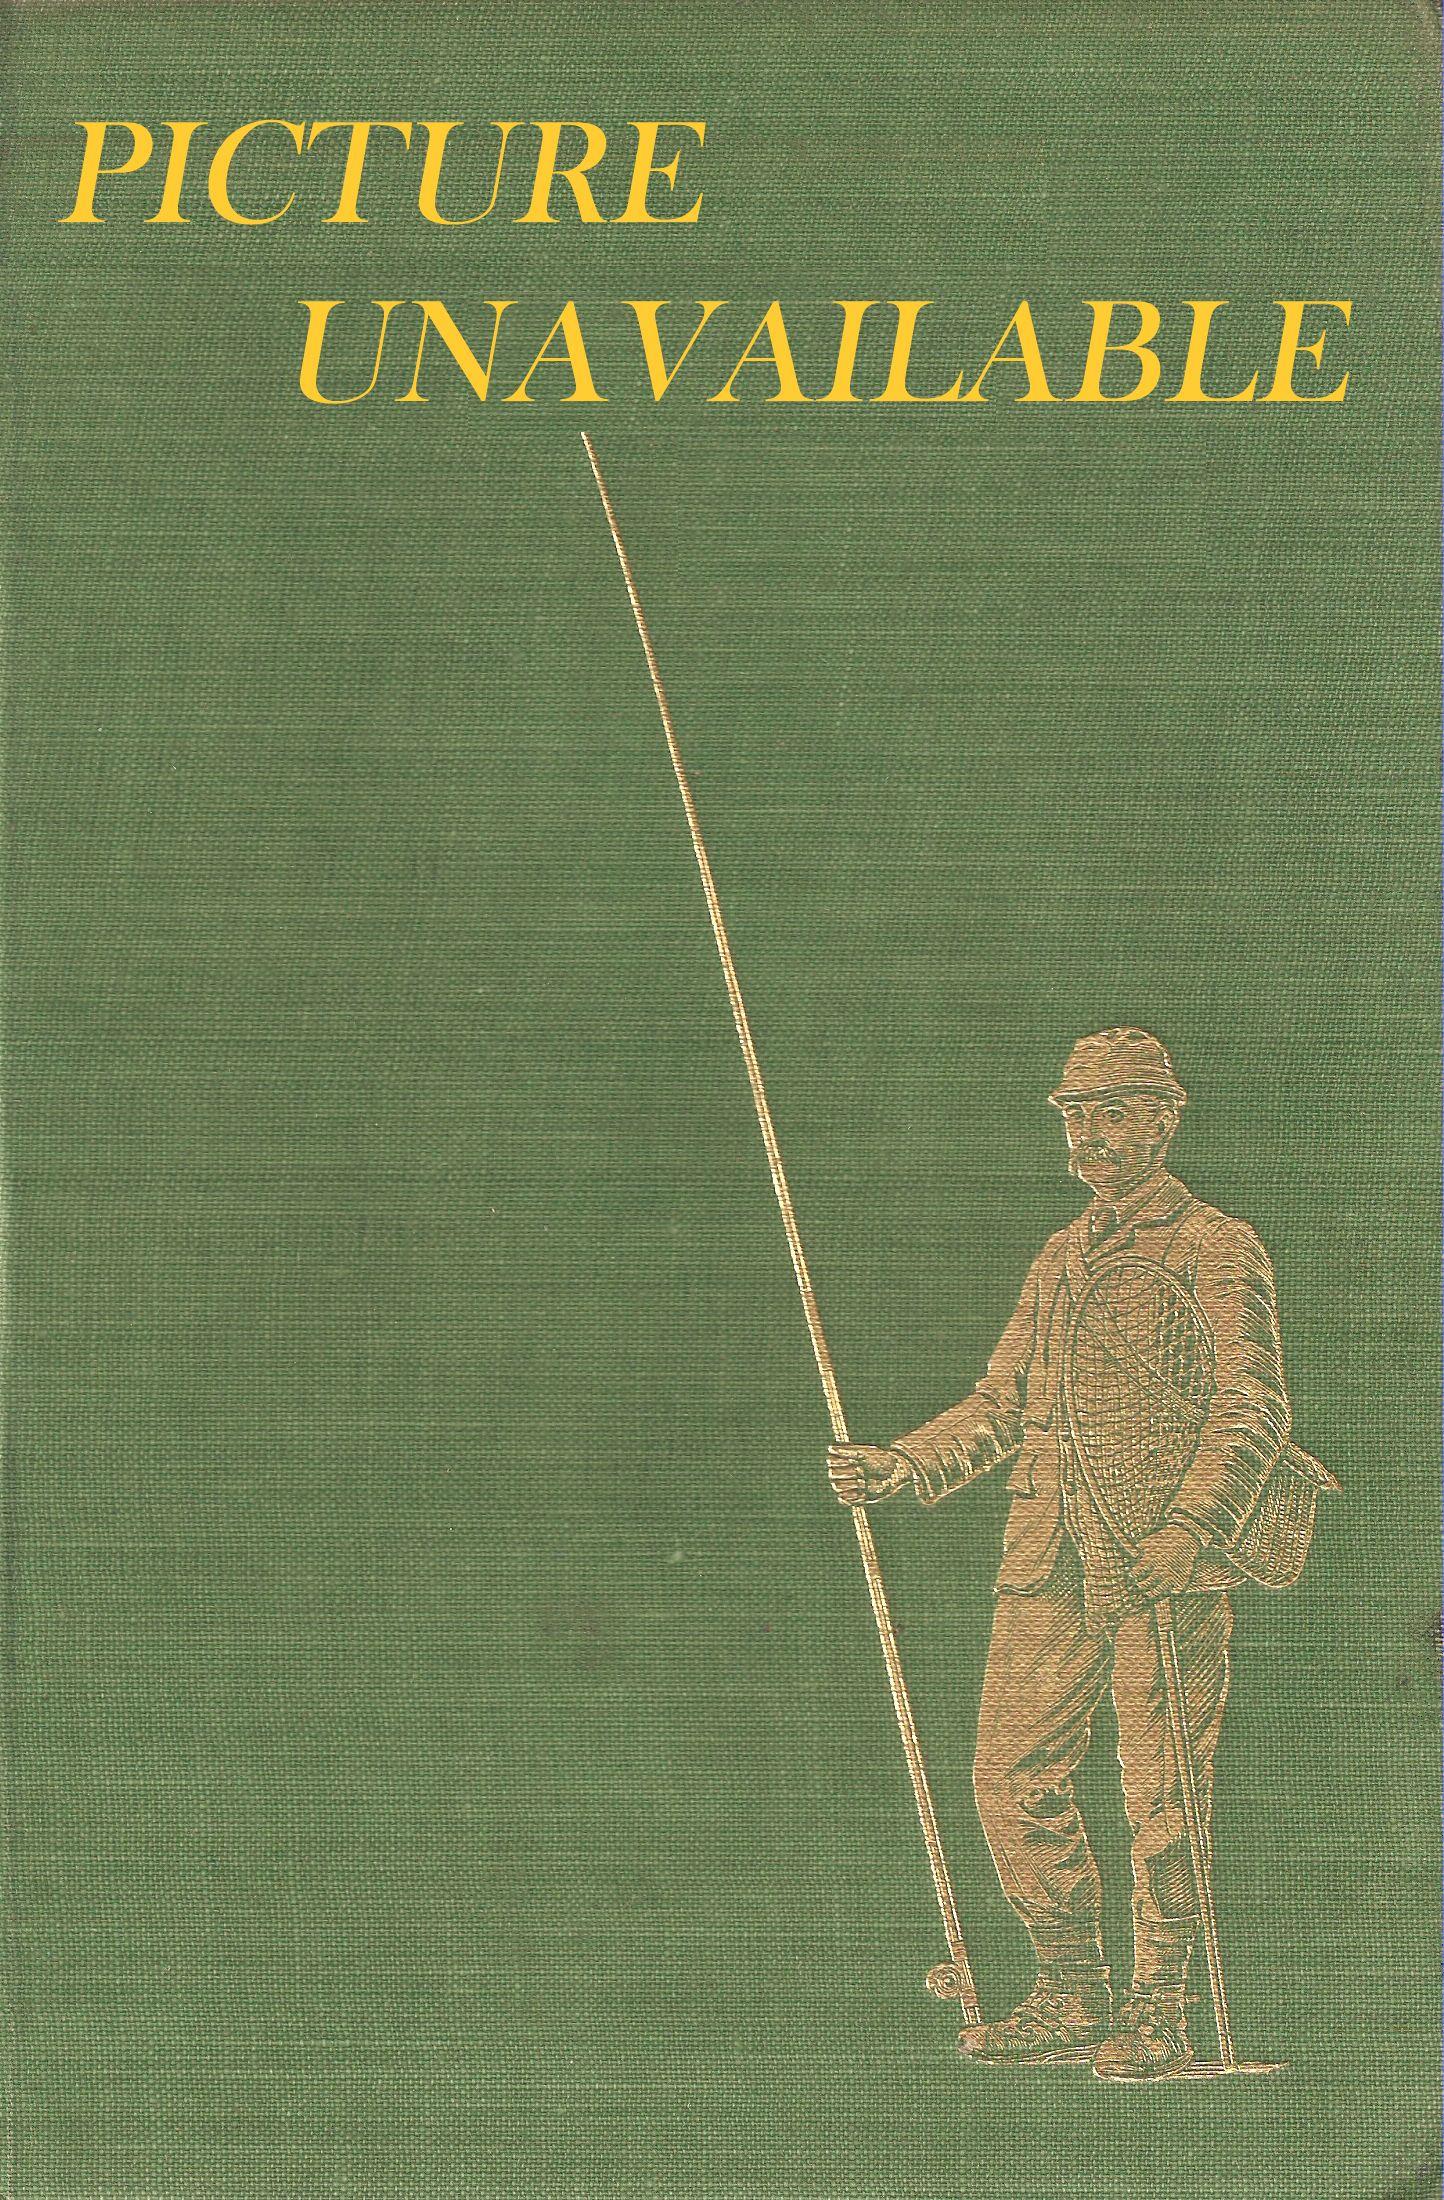 COD FISHING. By John Rawle.